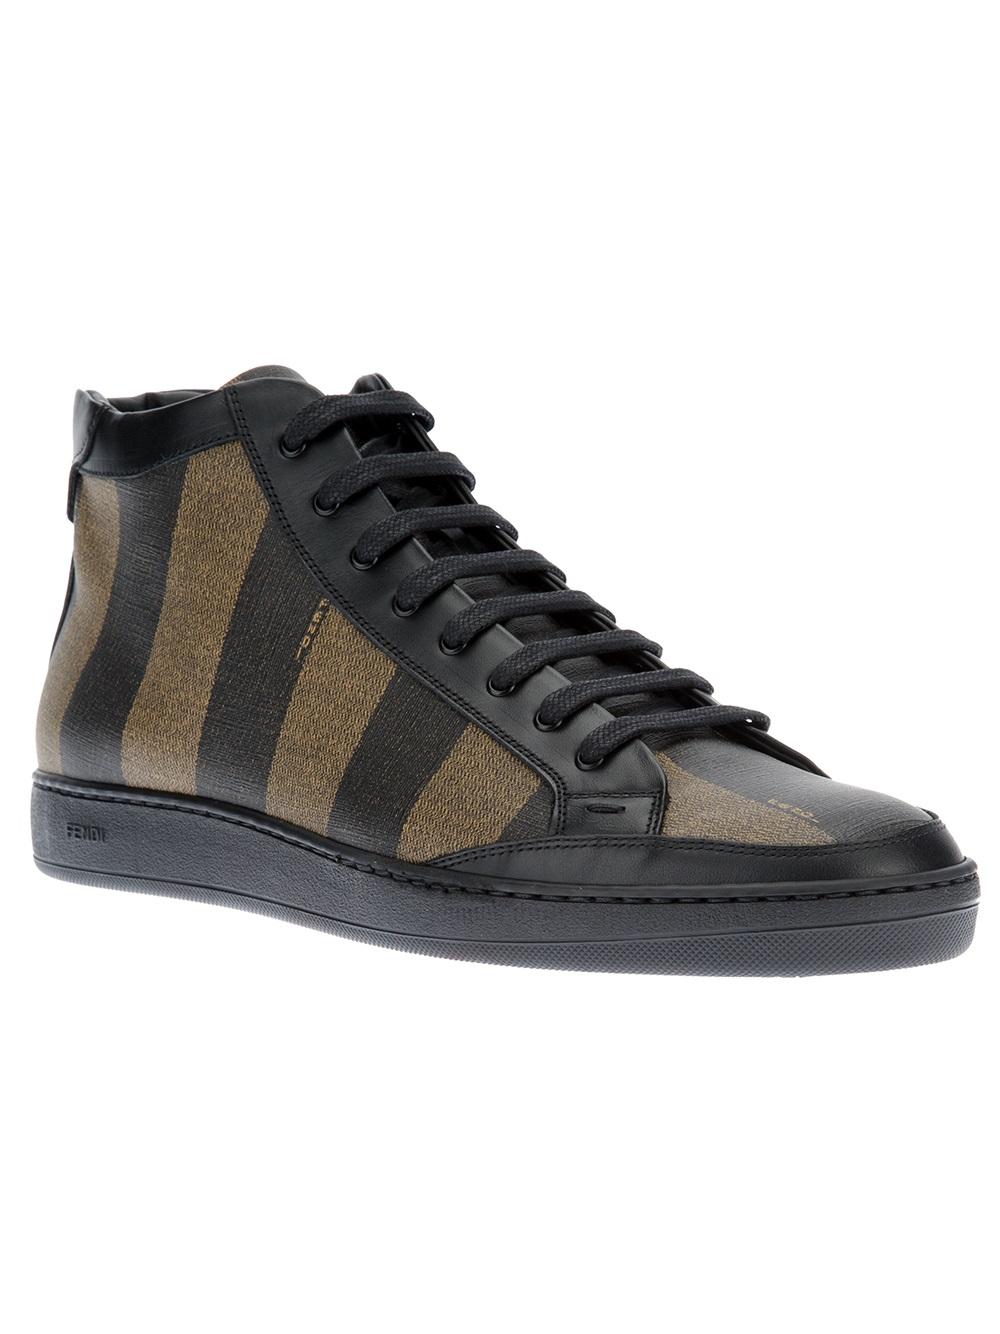 Fendi Striped Laceup Sneaker In Black For Men Tobacco Lyst